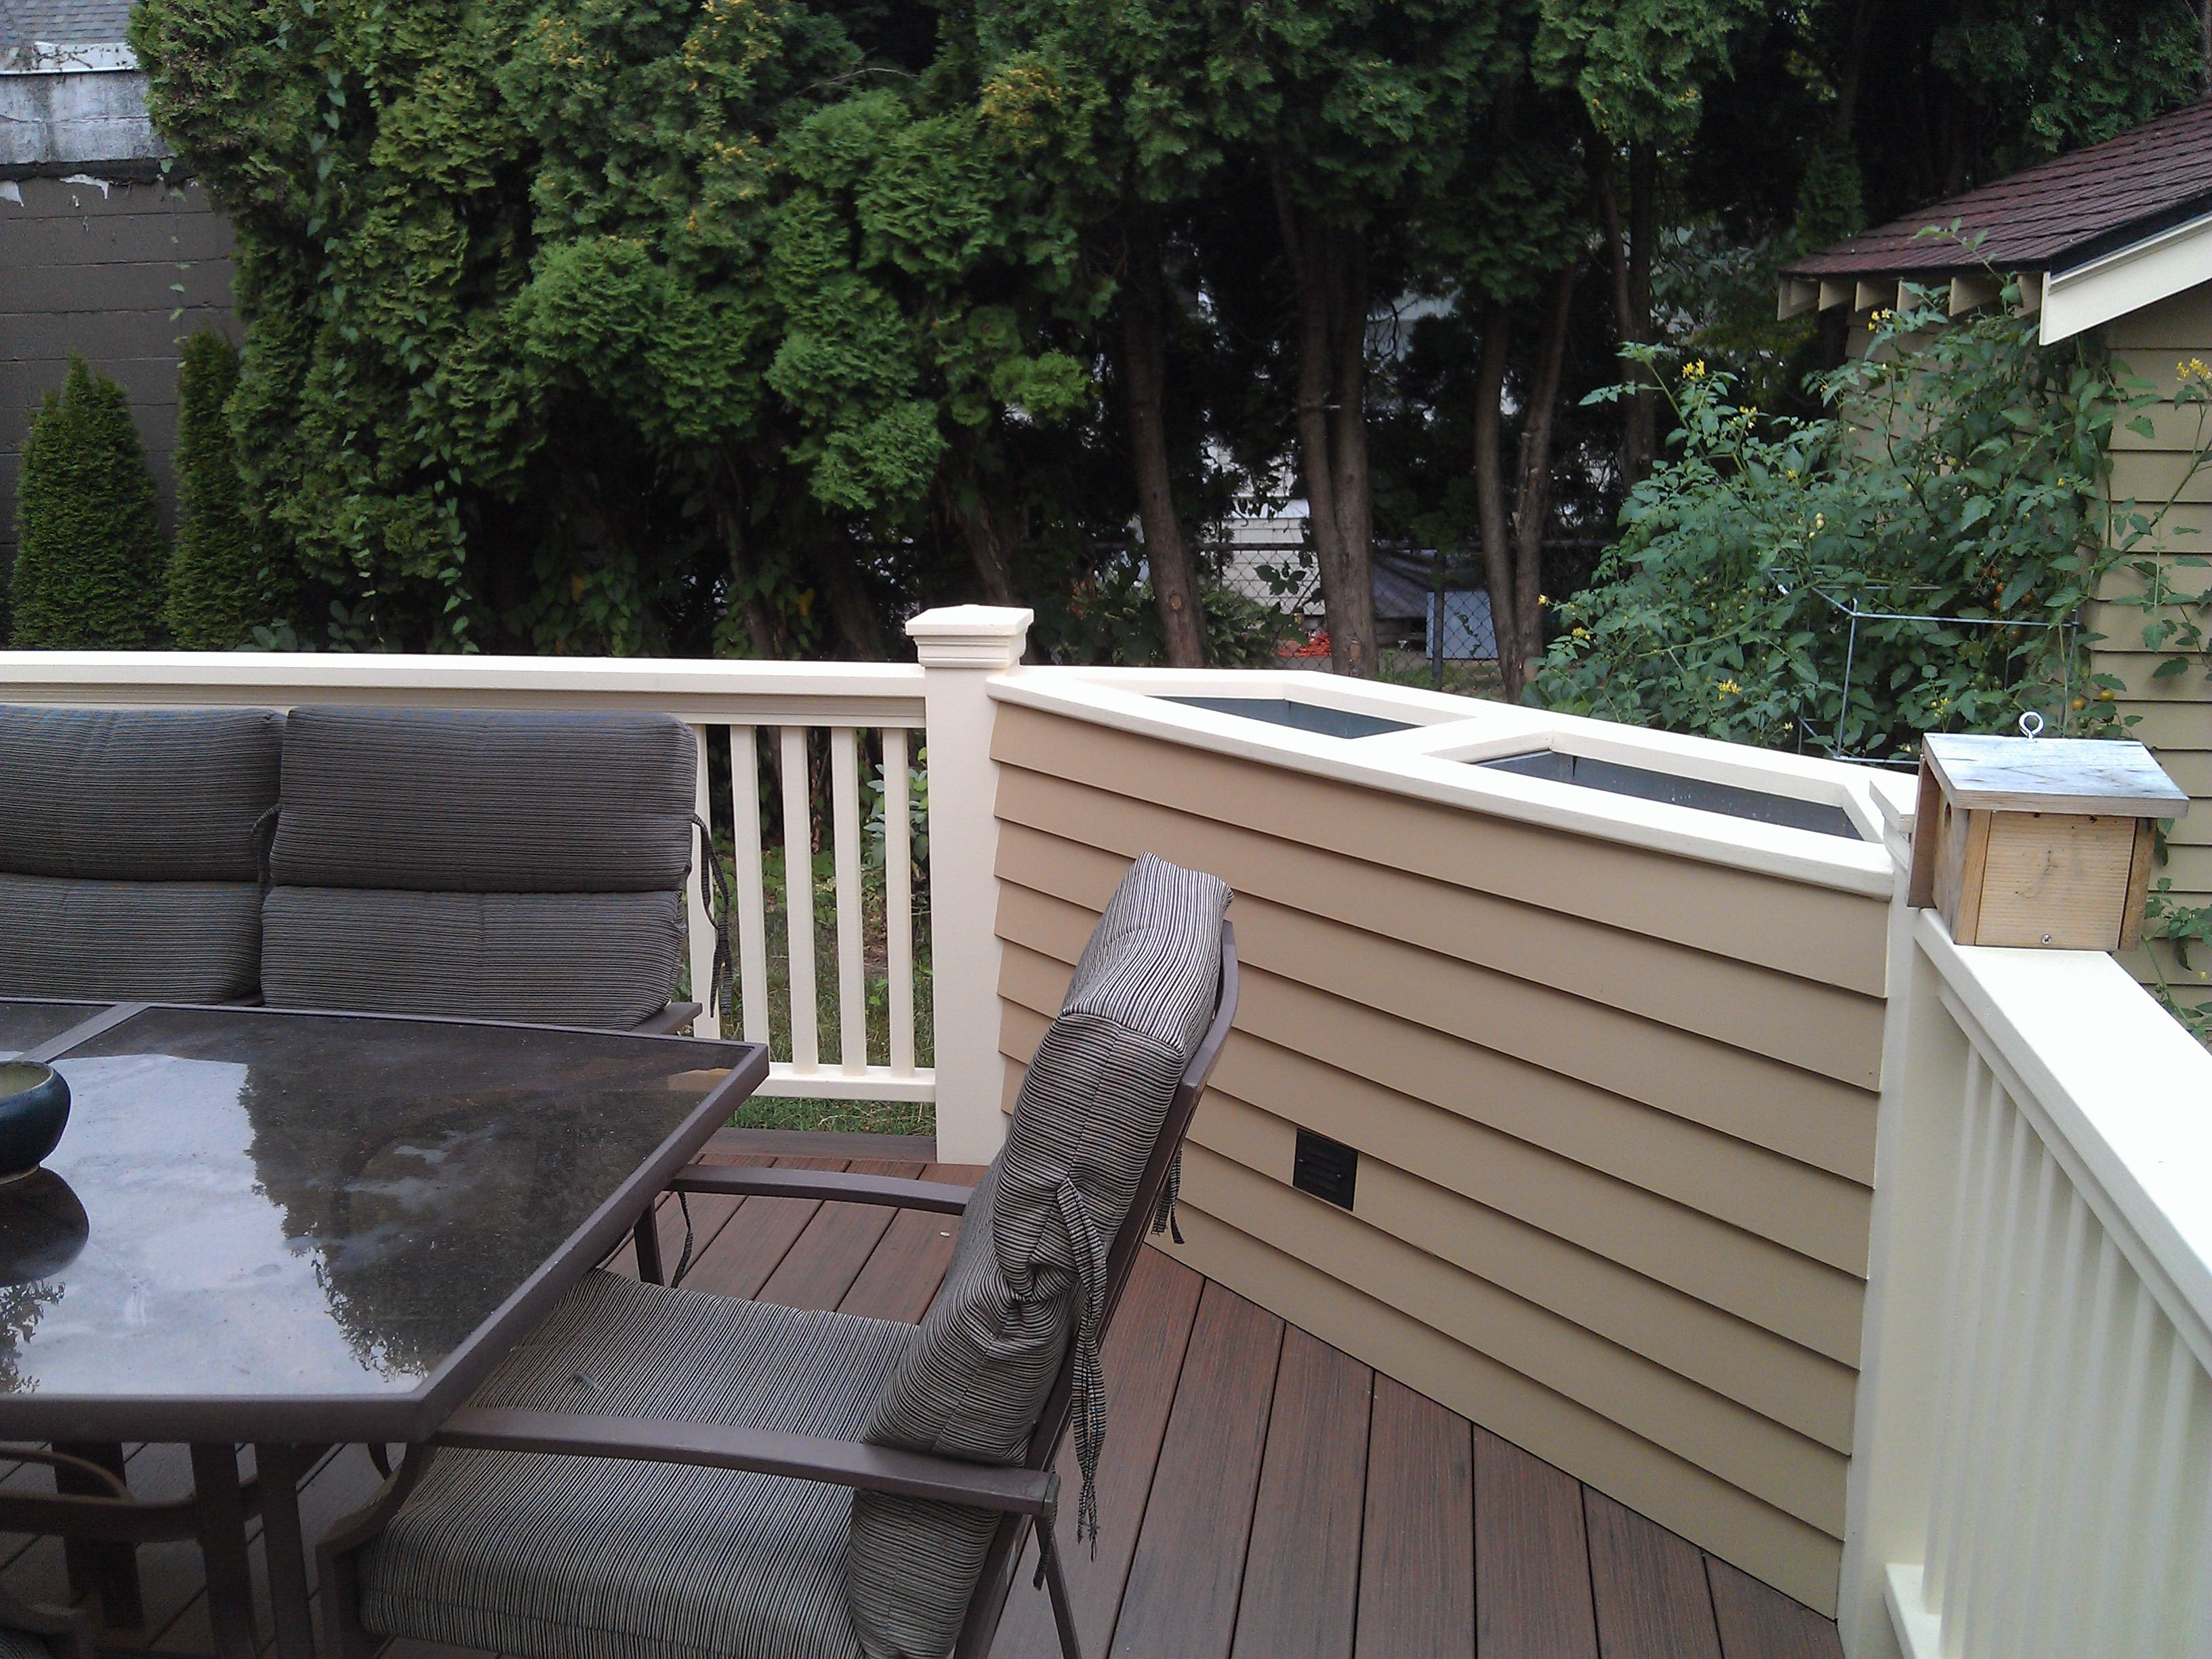 Custom planter box - built into the railings